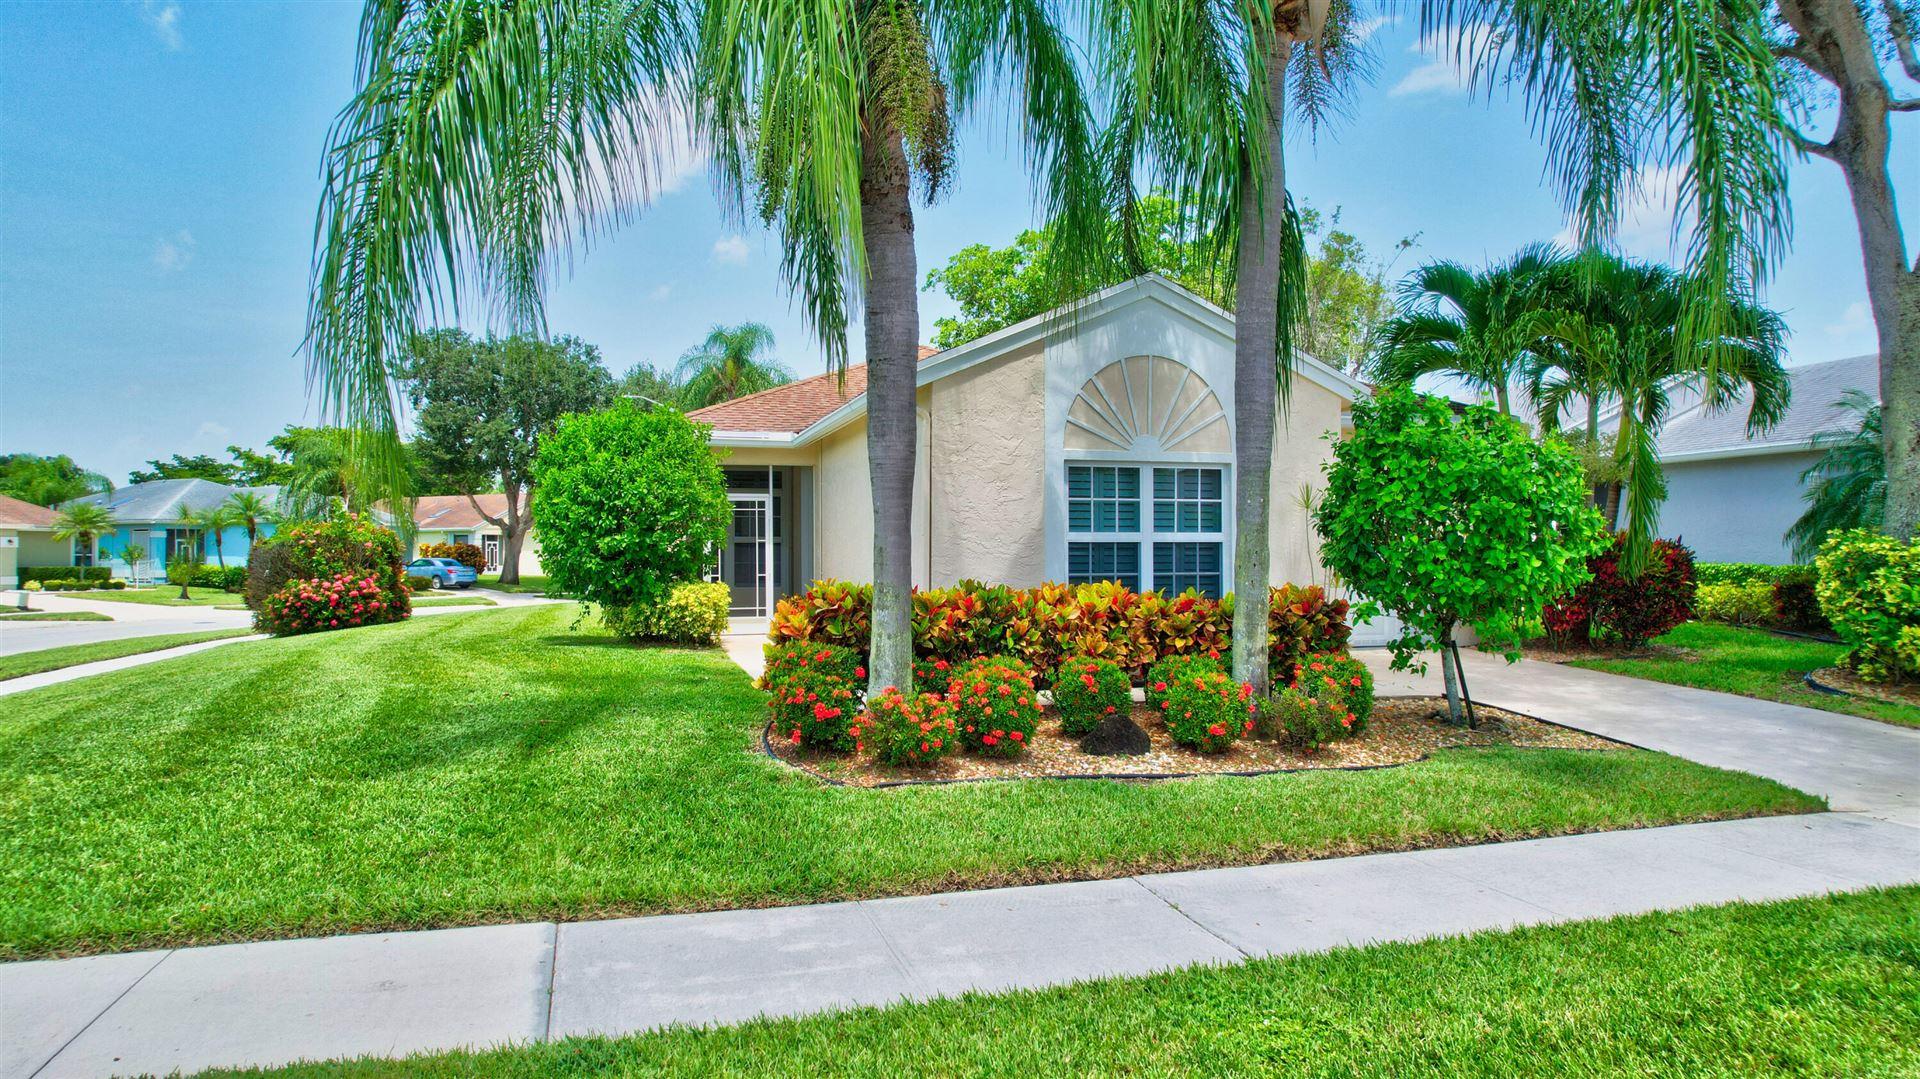 7629 Mansfield Hollow Road, Delray Beach, FL 33446 - MLS#: RX-10743426